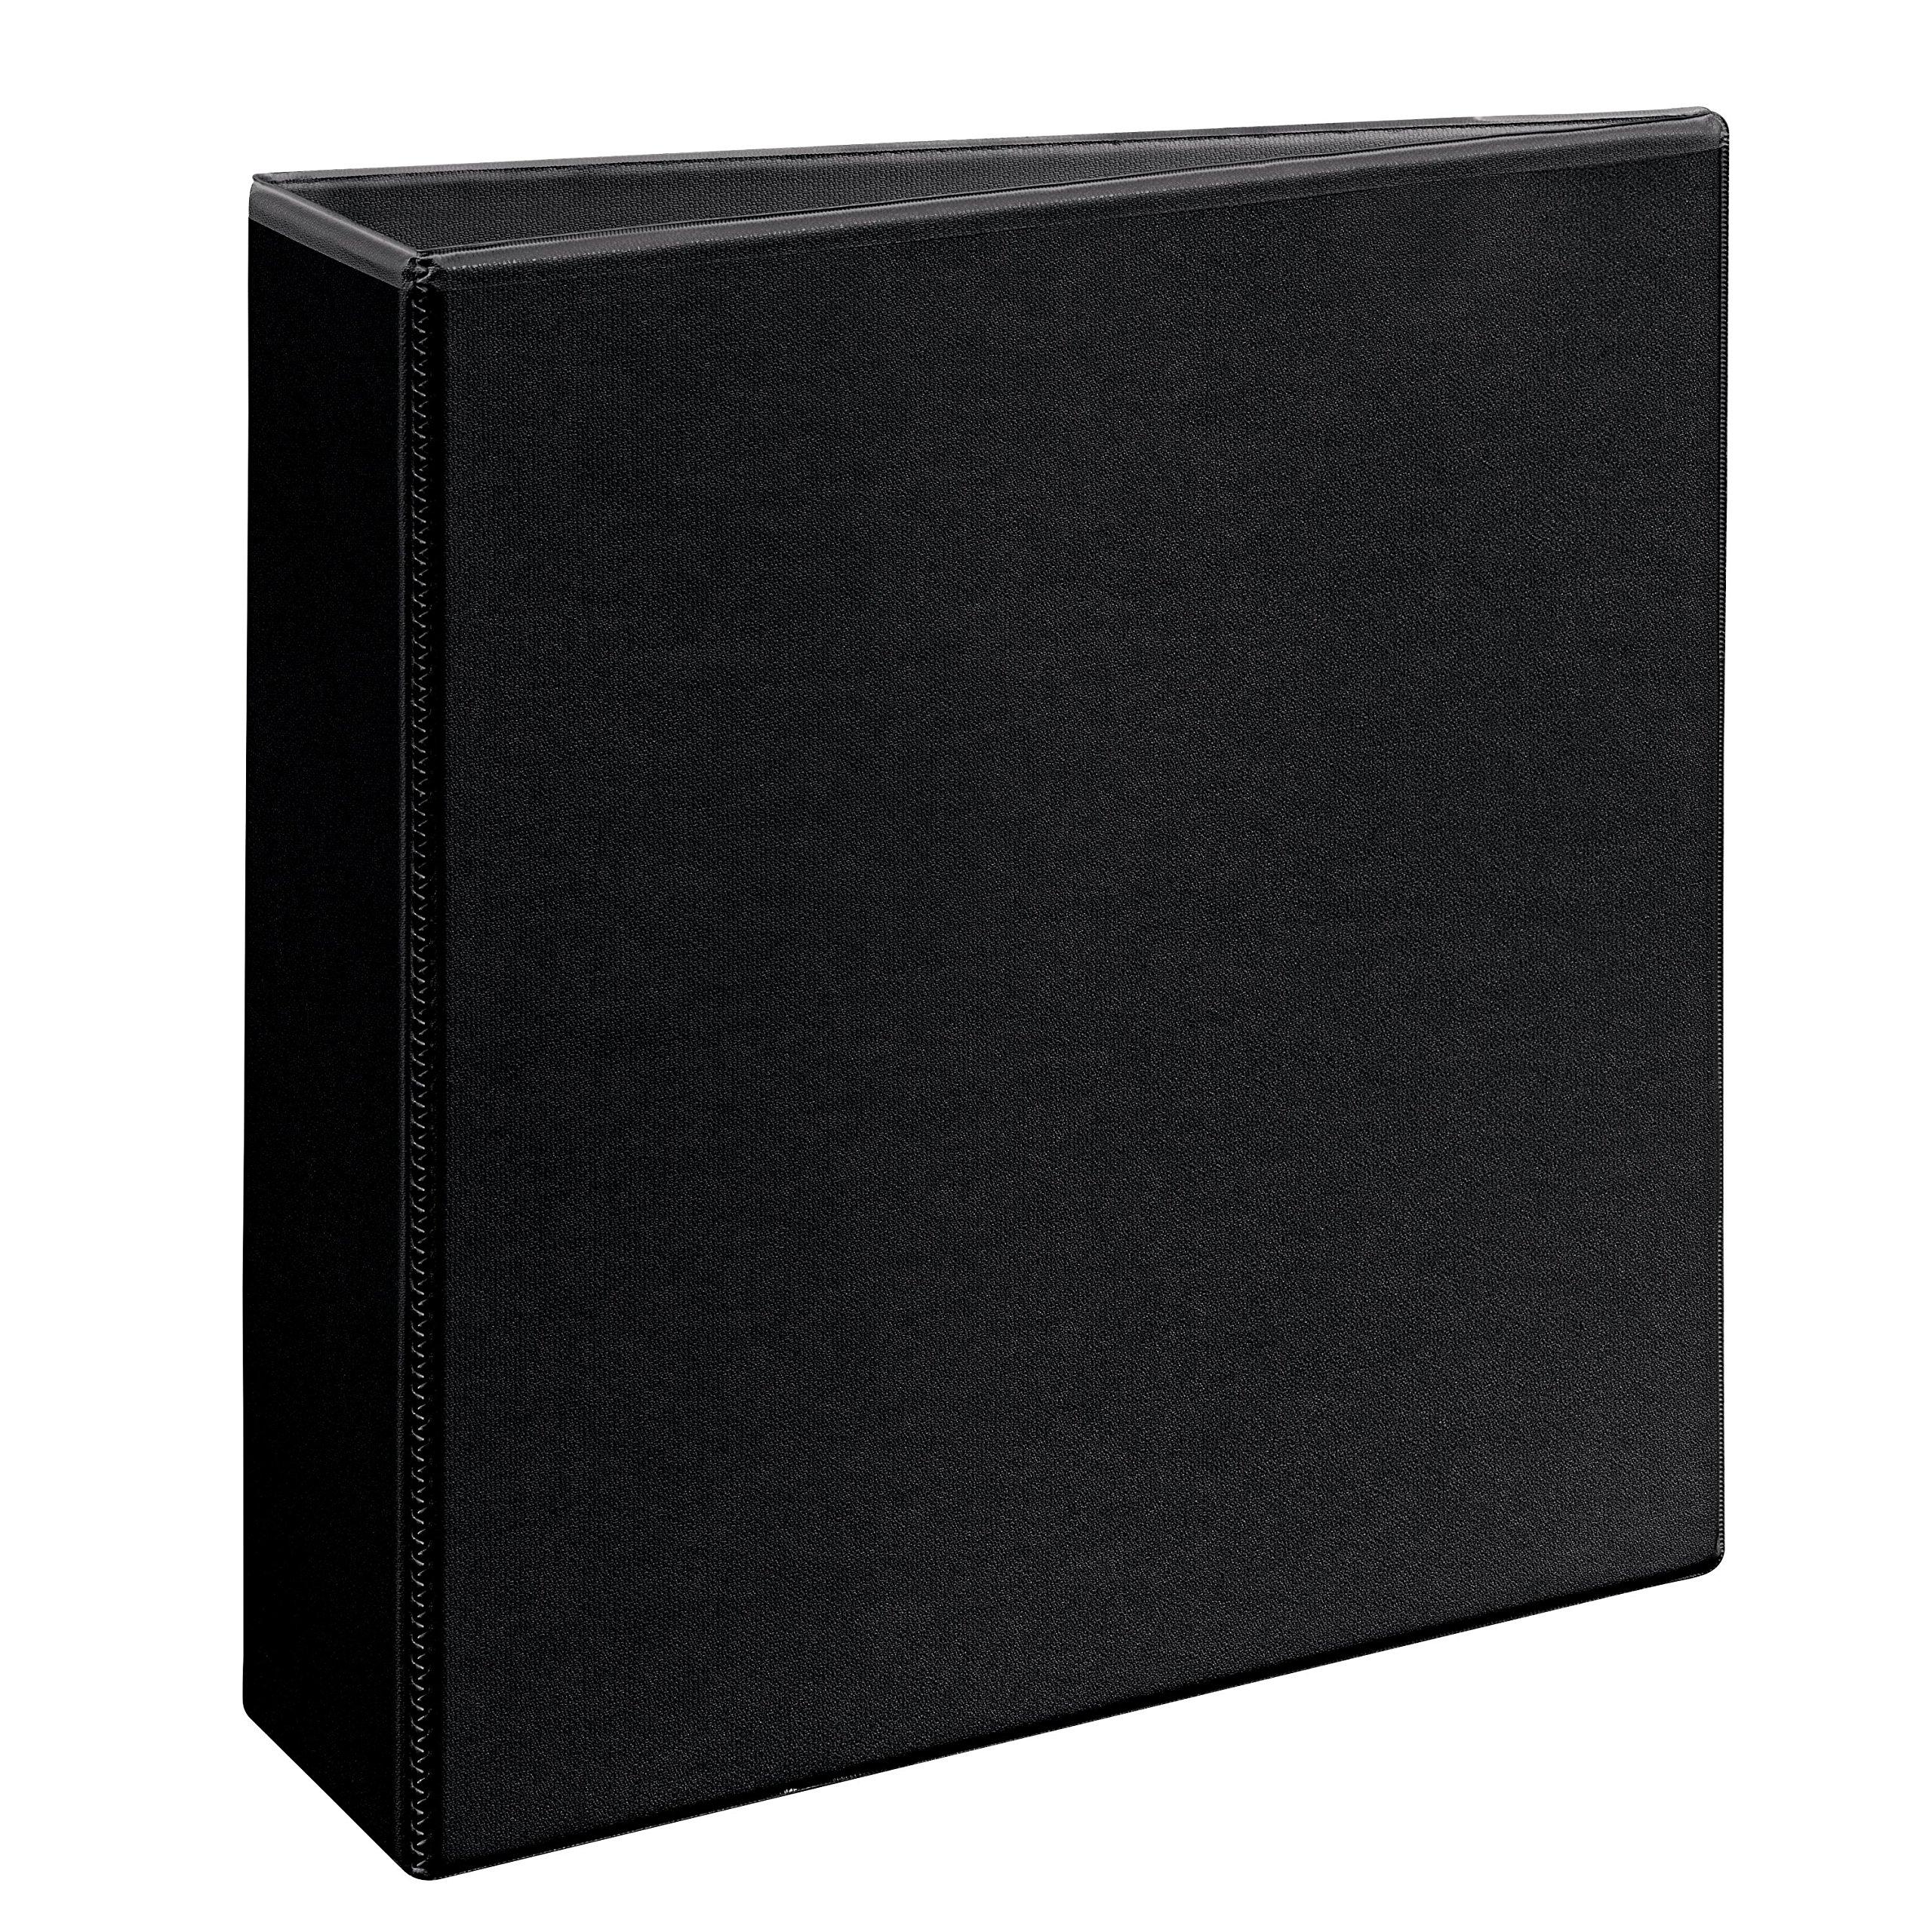 Avery Durable View Binder EZD Rings, 3'' One Touch Rings, 670-Sheet Capacity, DuraHinge, Black (09700)